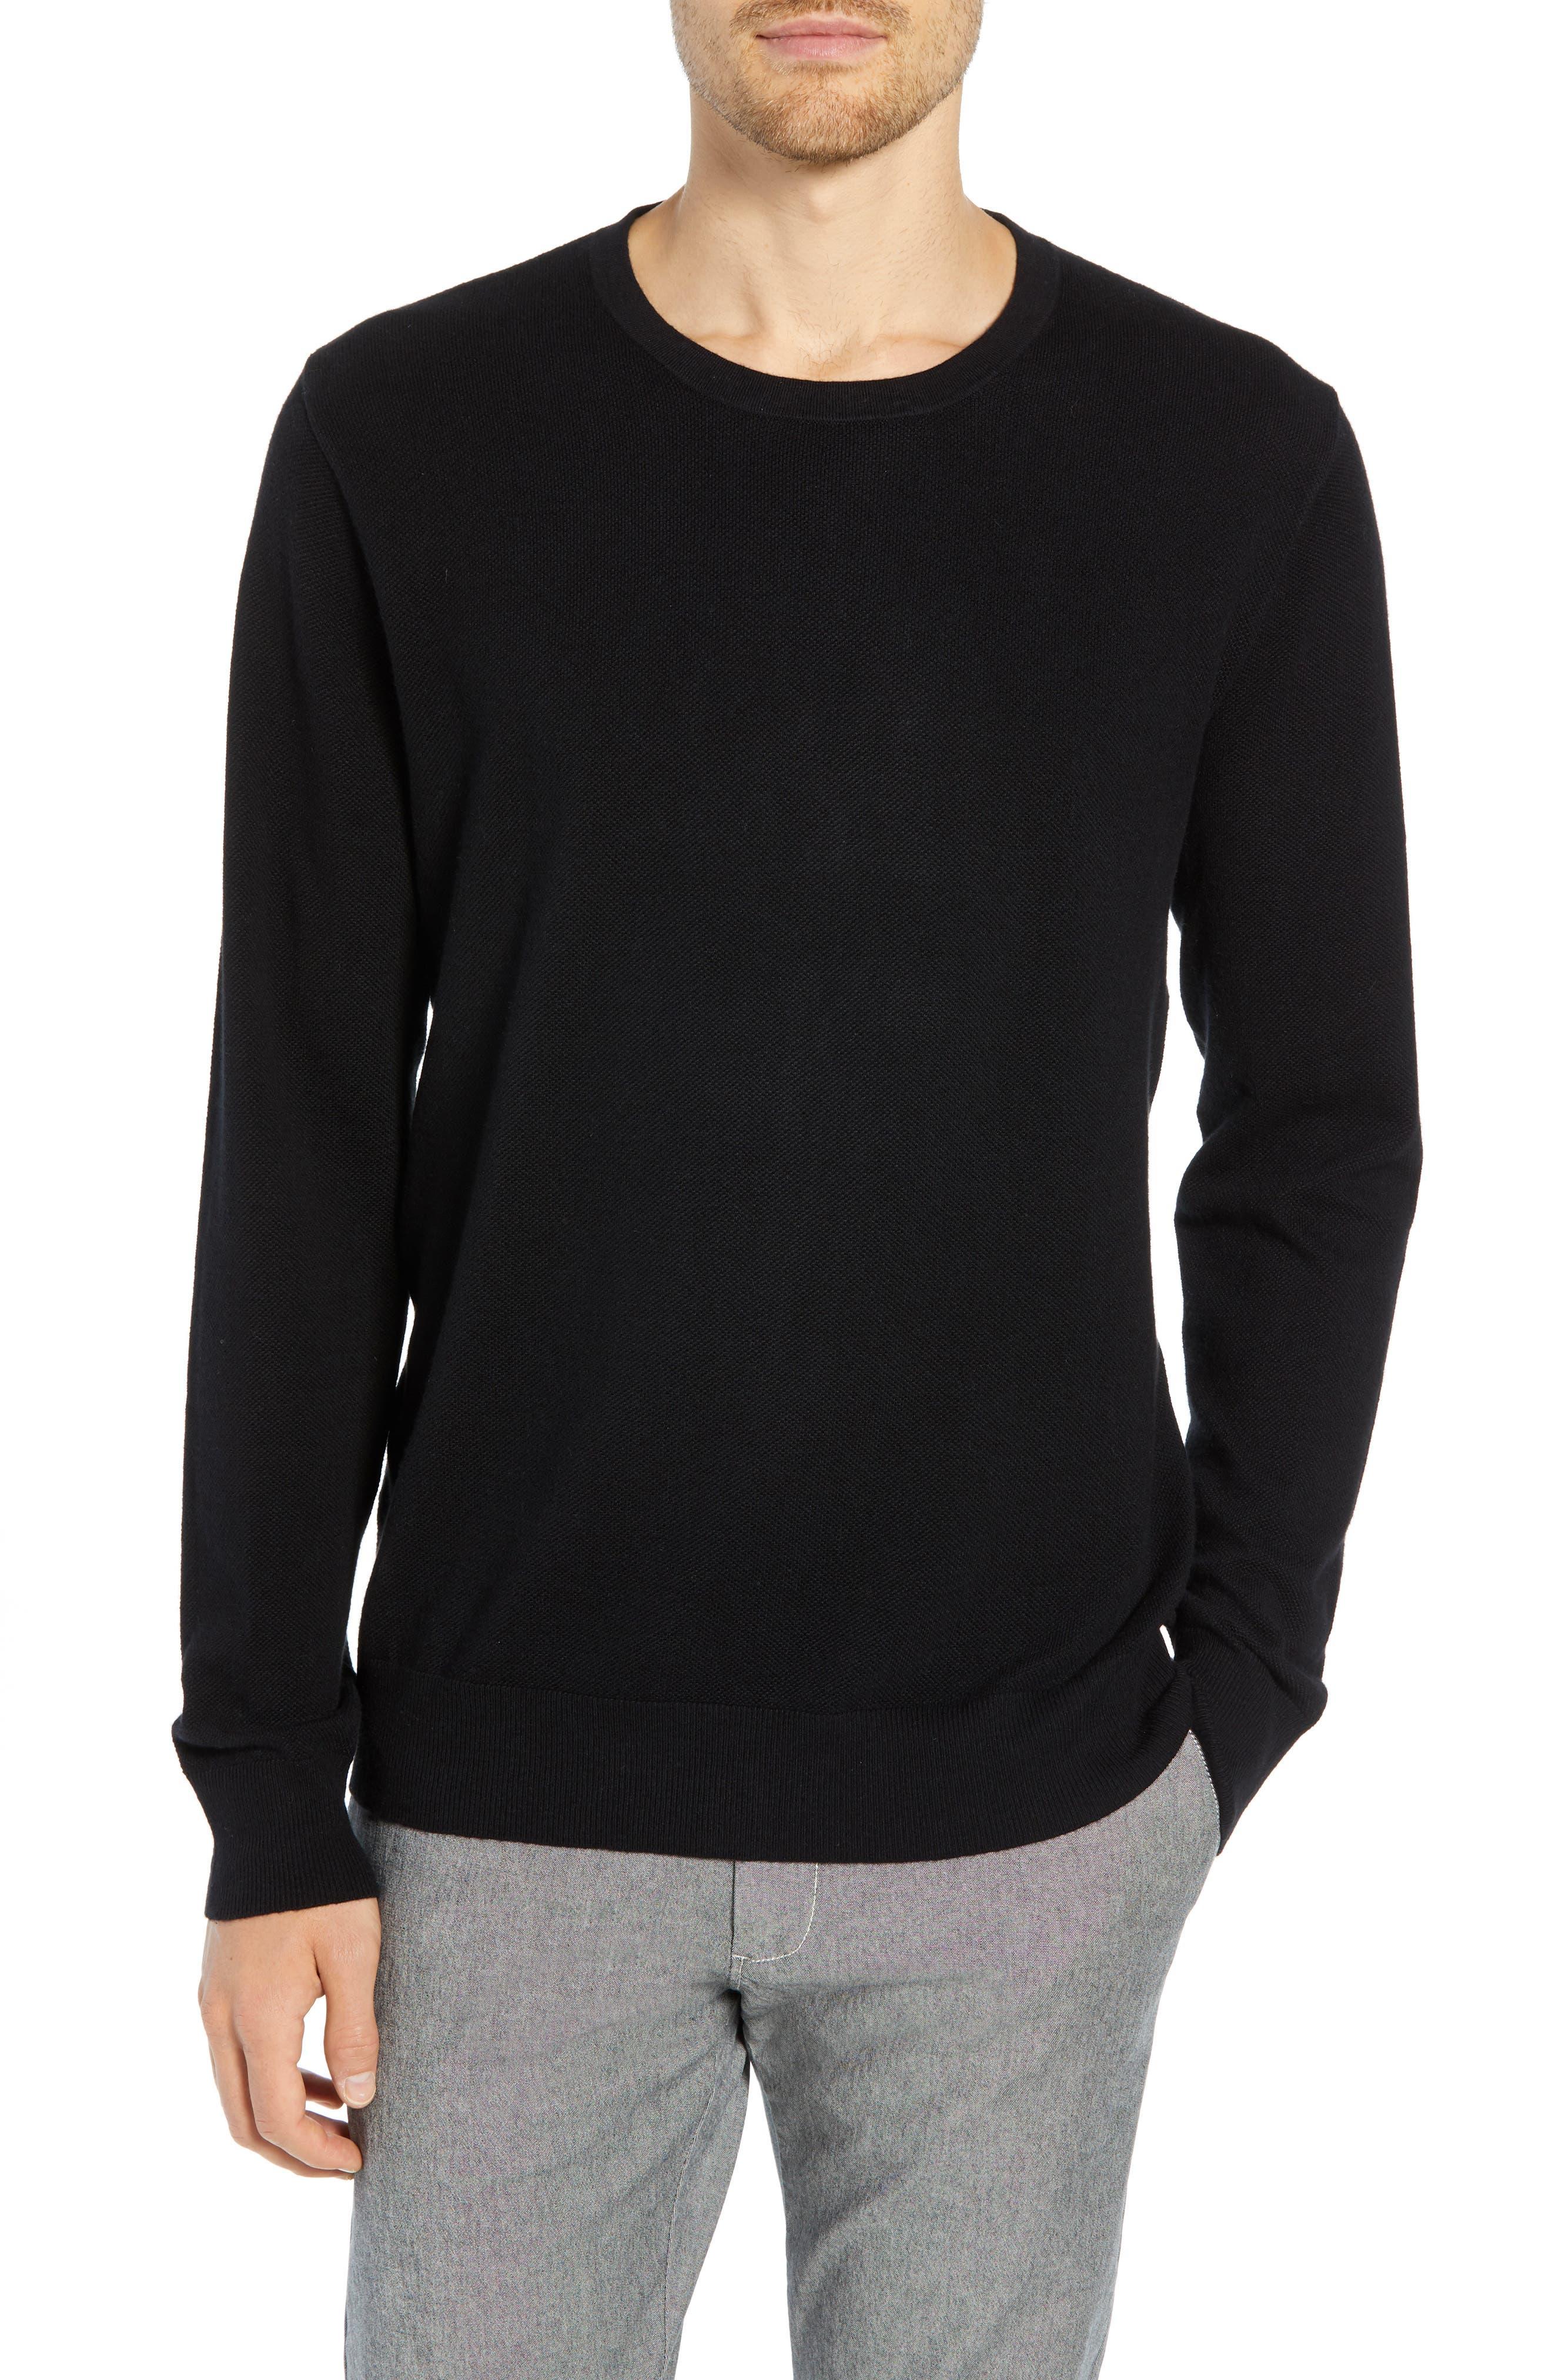 J.CREW Cotton & Cashmere Pique Crewneck Sweater in Heather Pecan